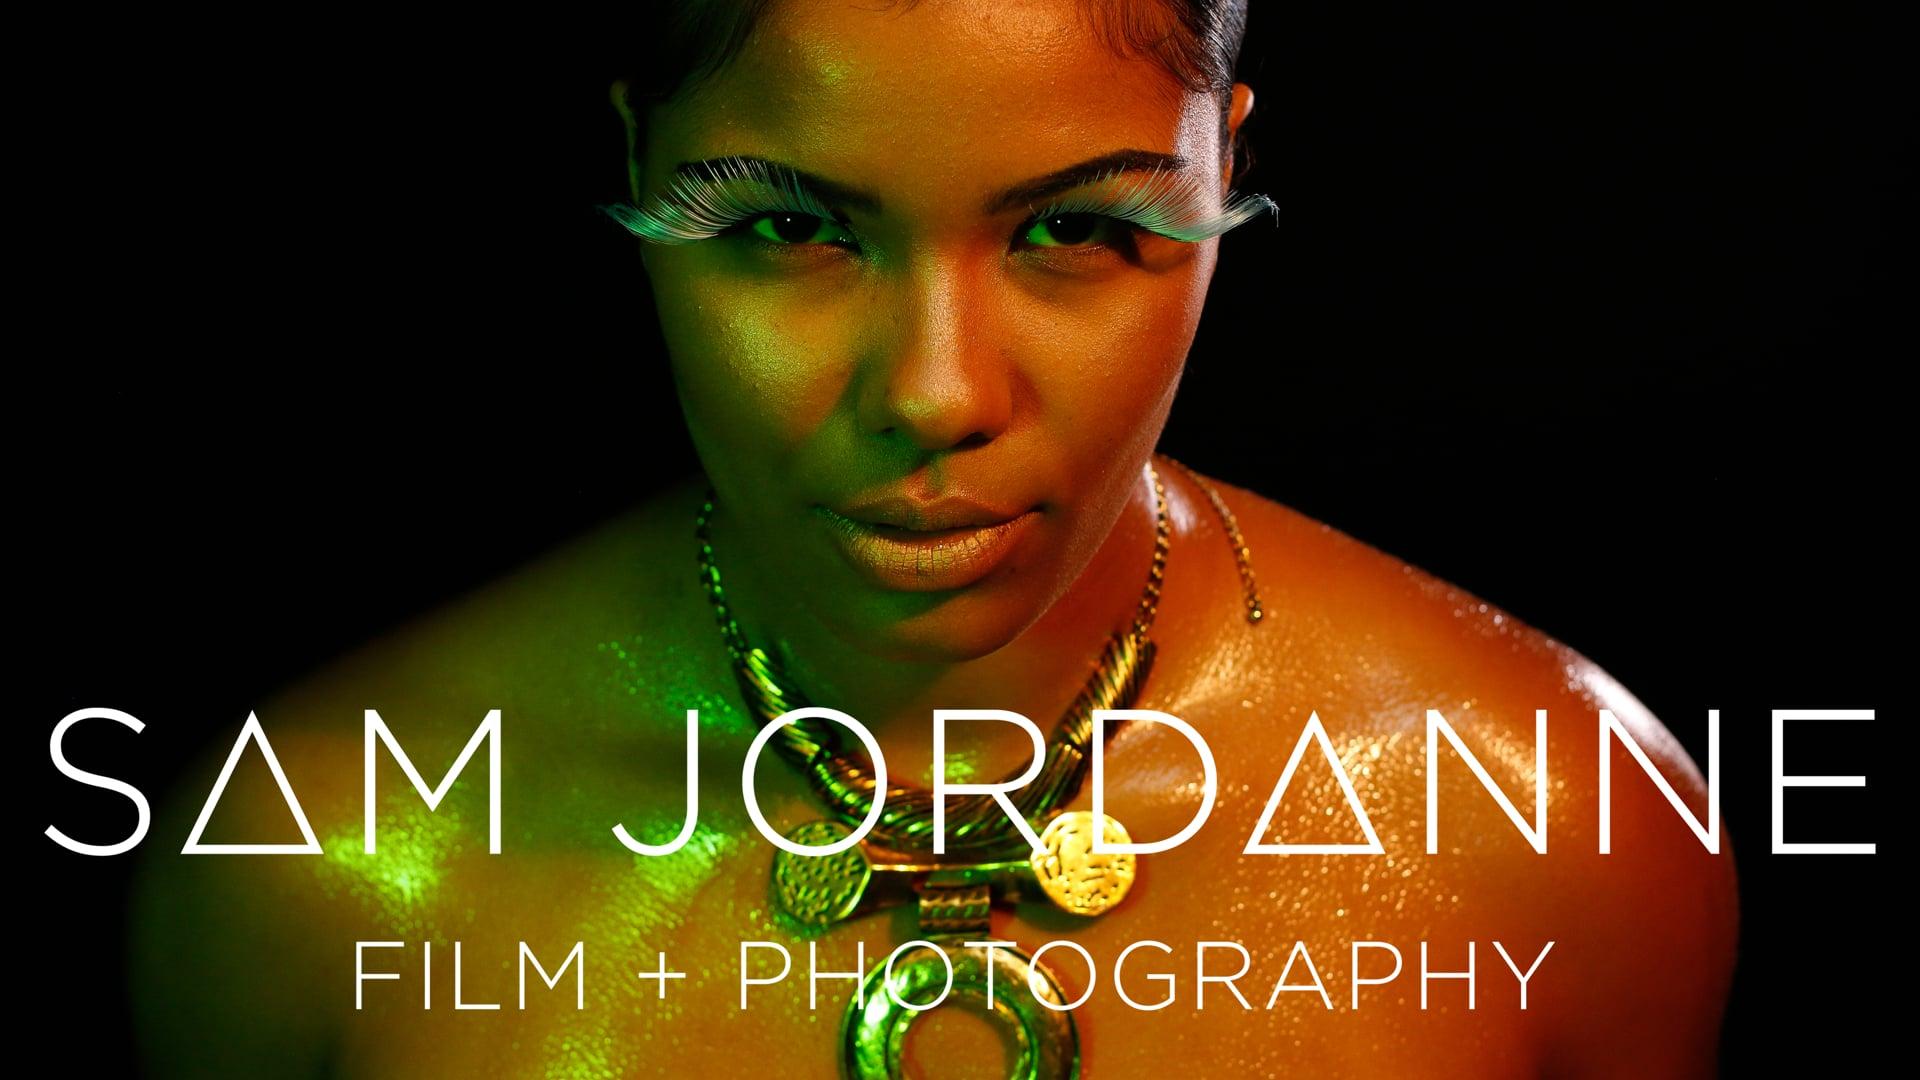 Sam Jordanne - Film + Photography Showreel